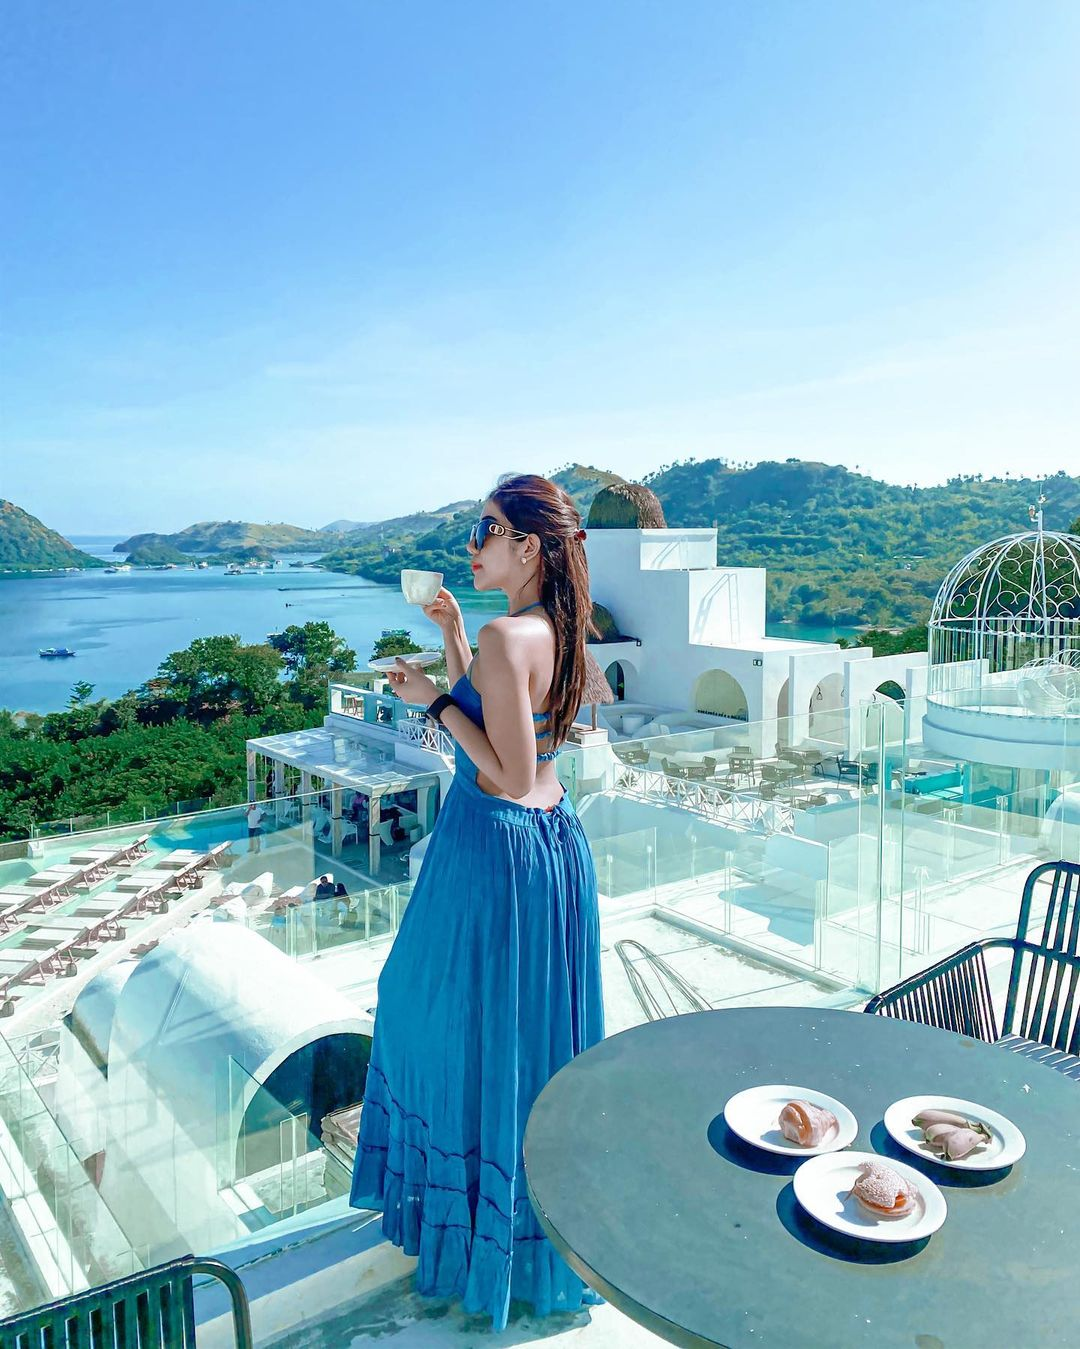 Bersantai Di Loccal Collection Hotel Labuan Bajo Image From @kariniiwang__